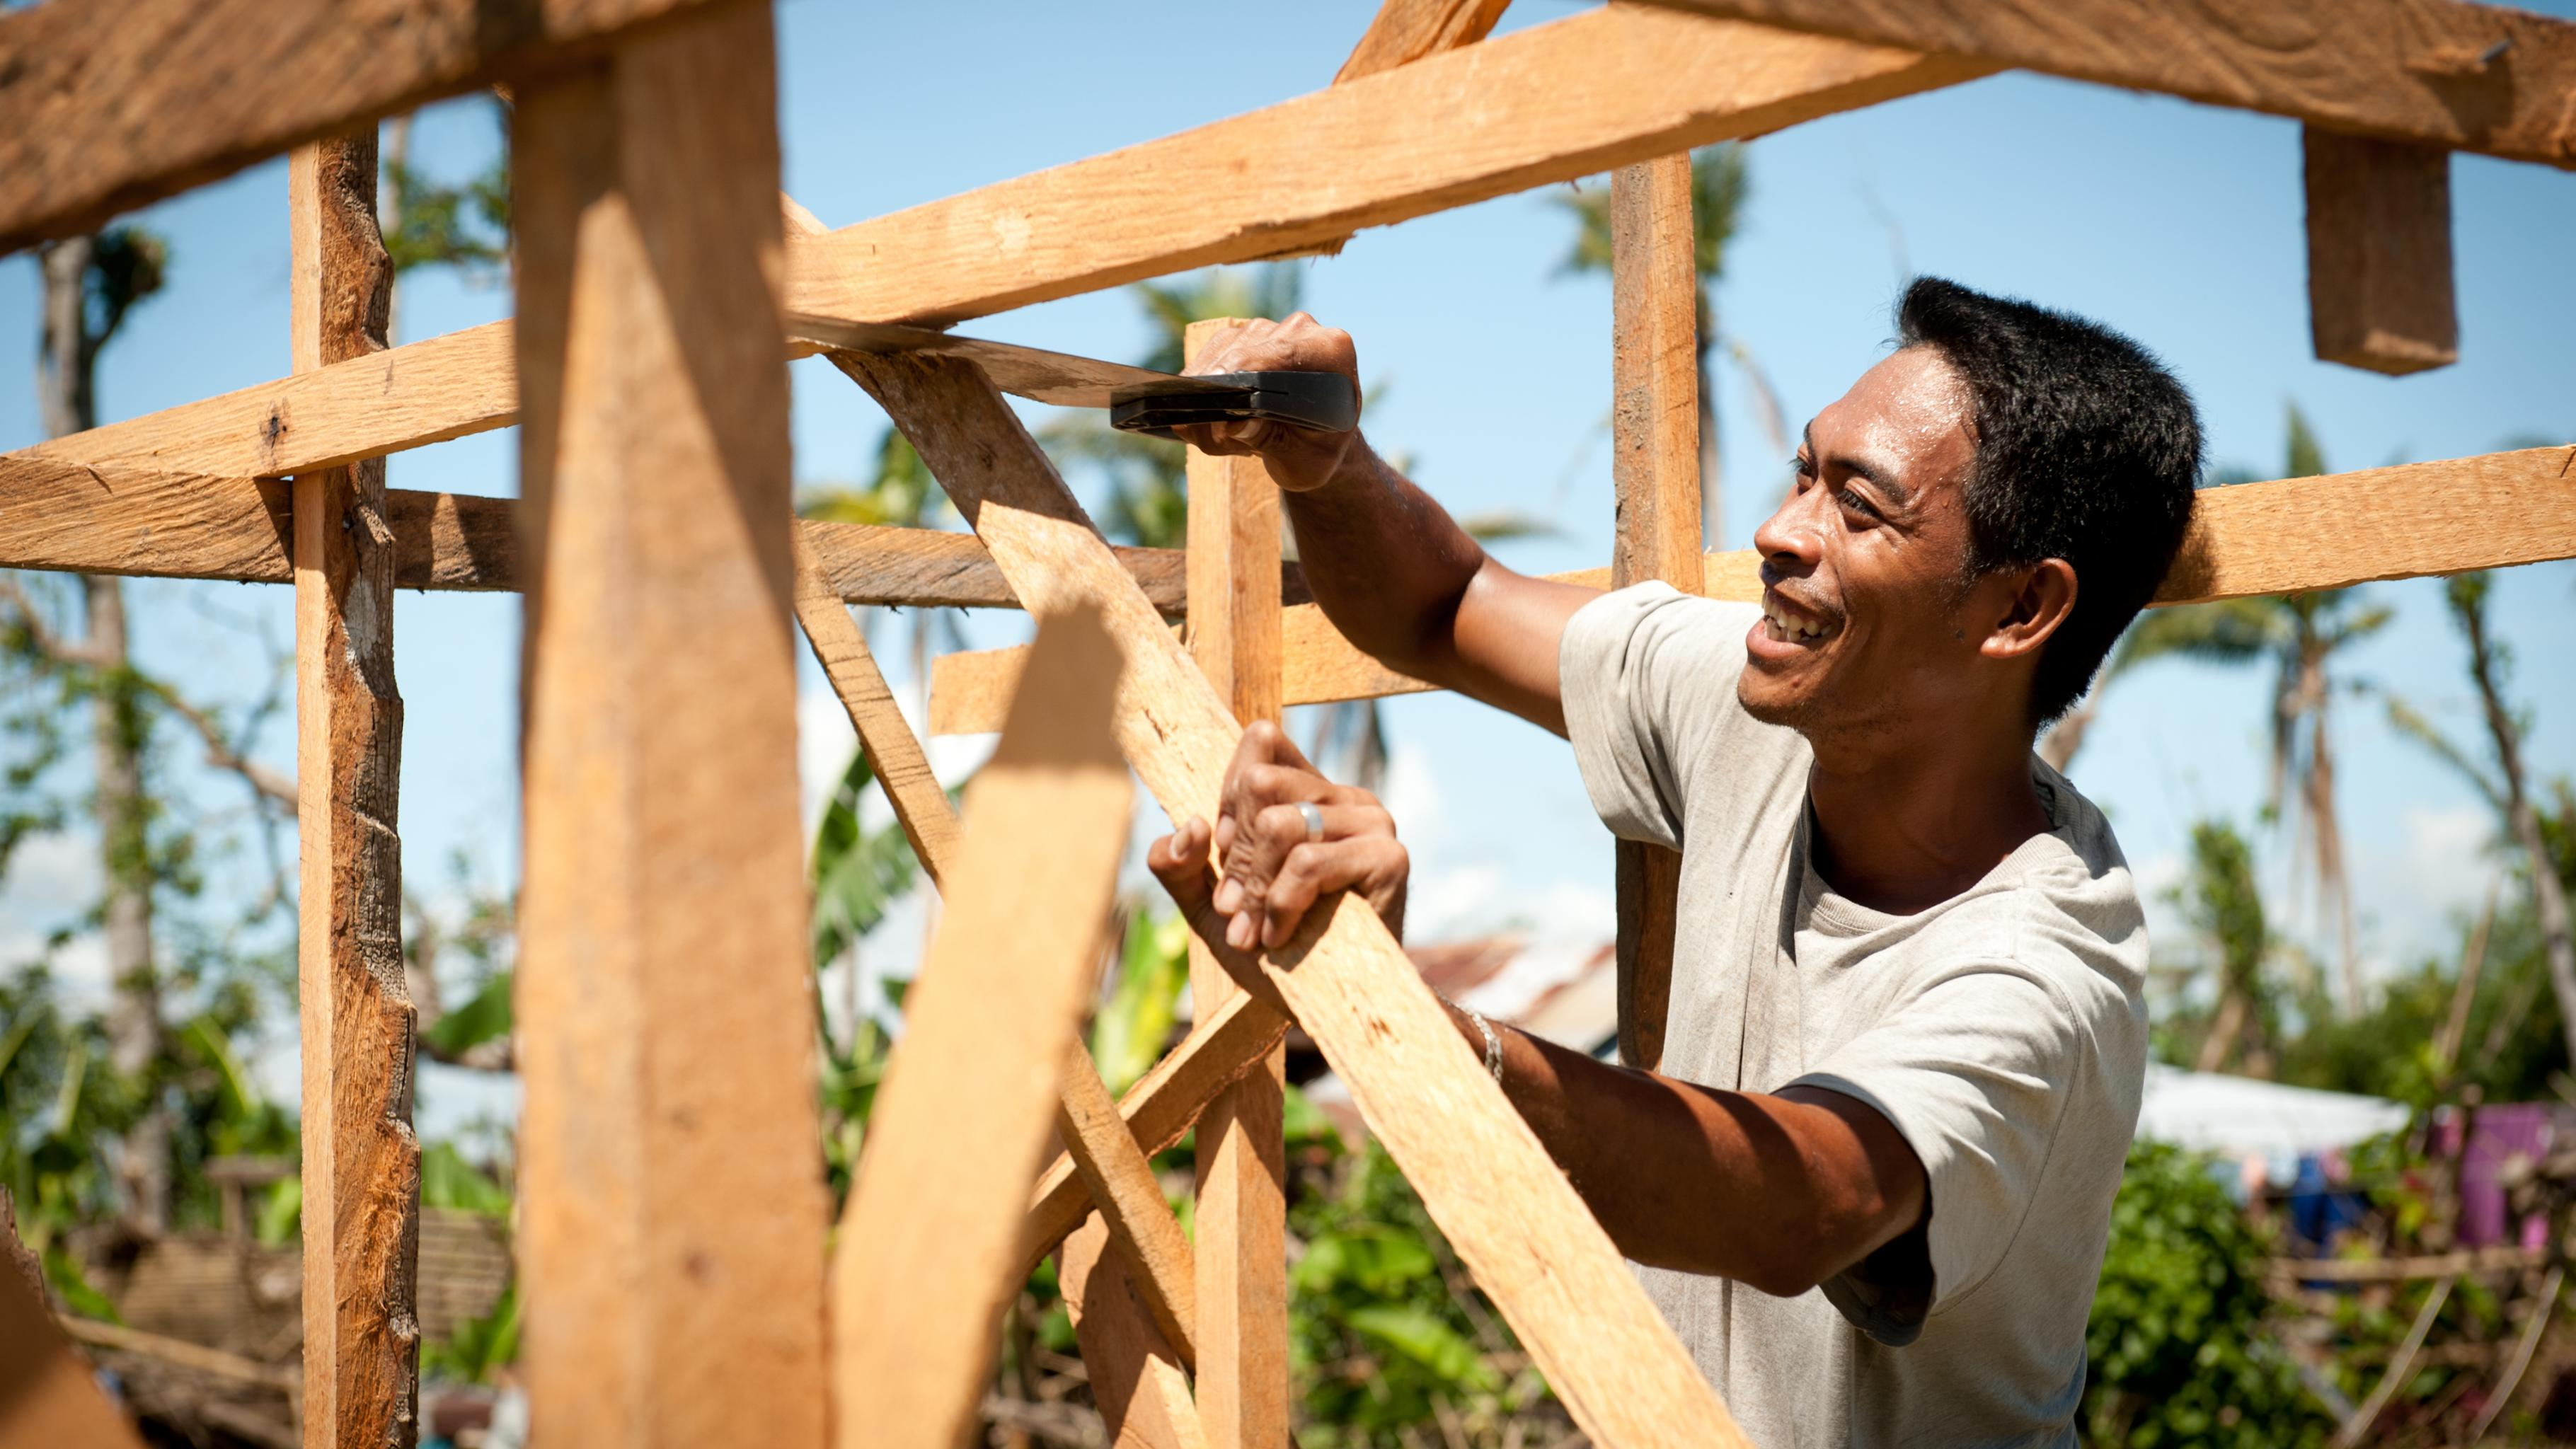 Mann baut Kiosk aus Holz